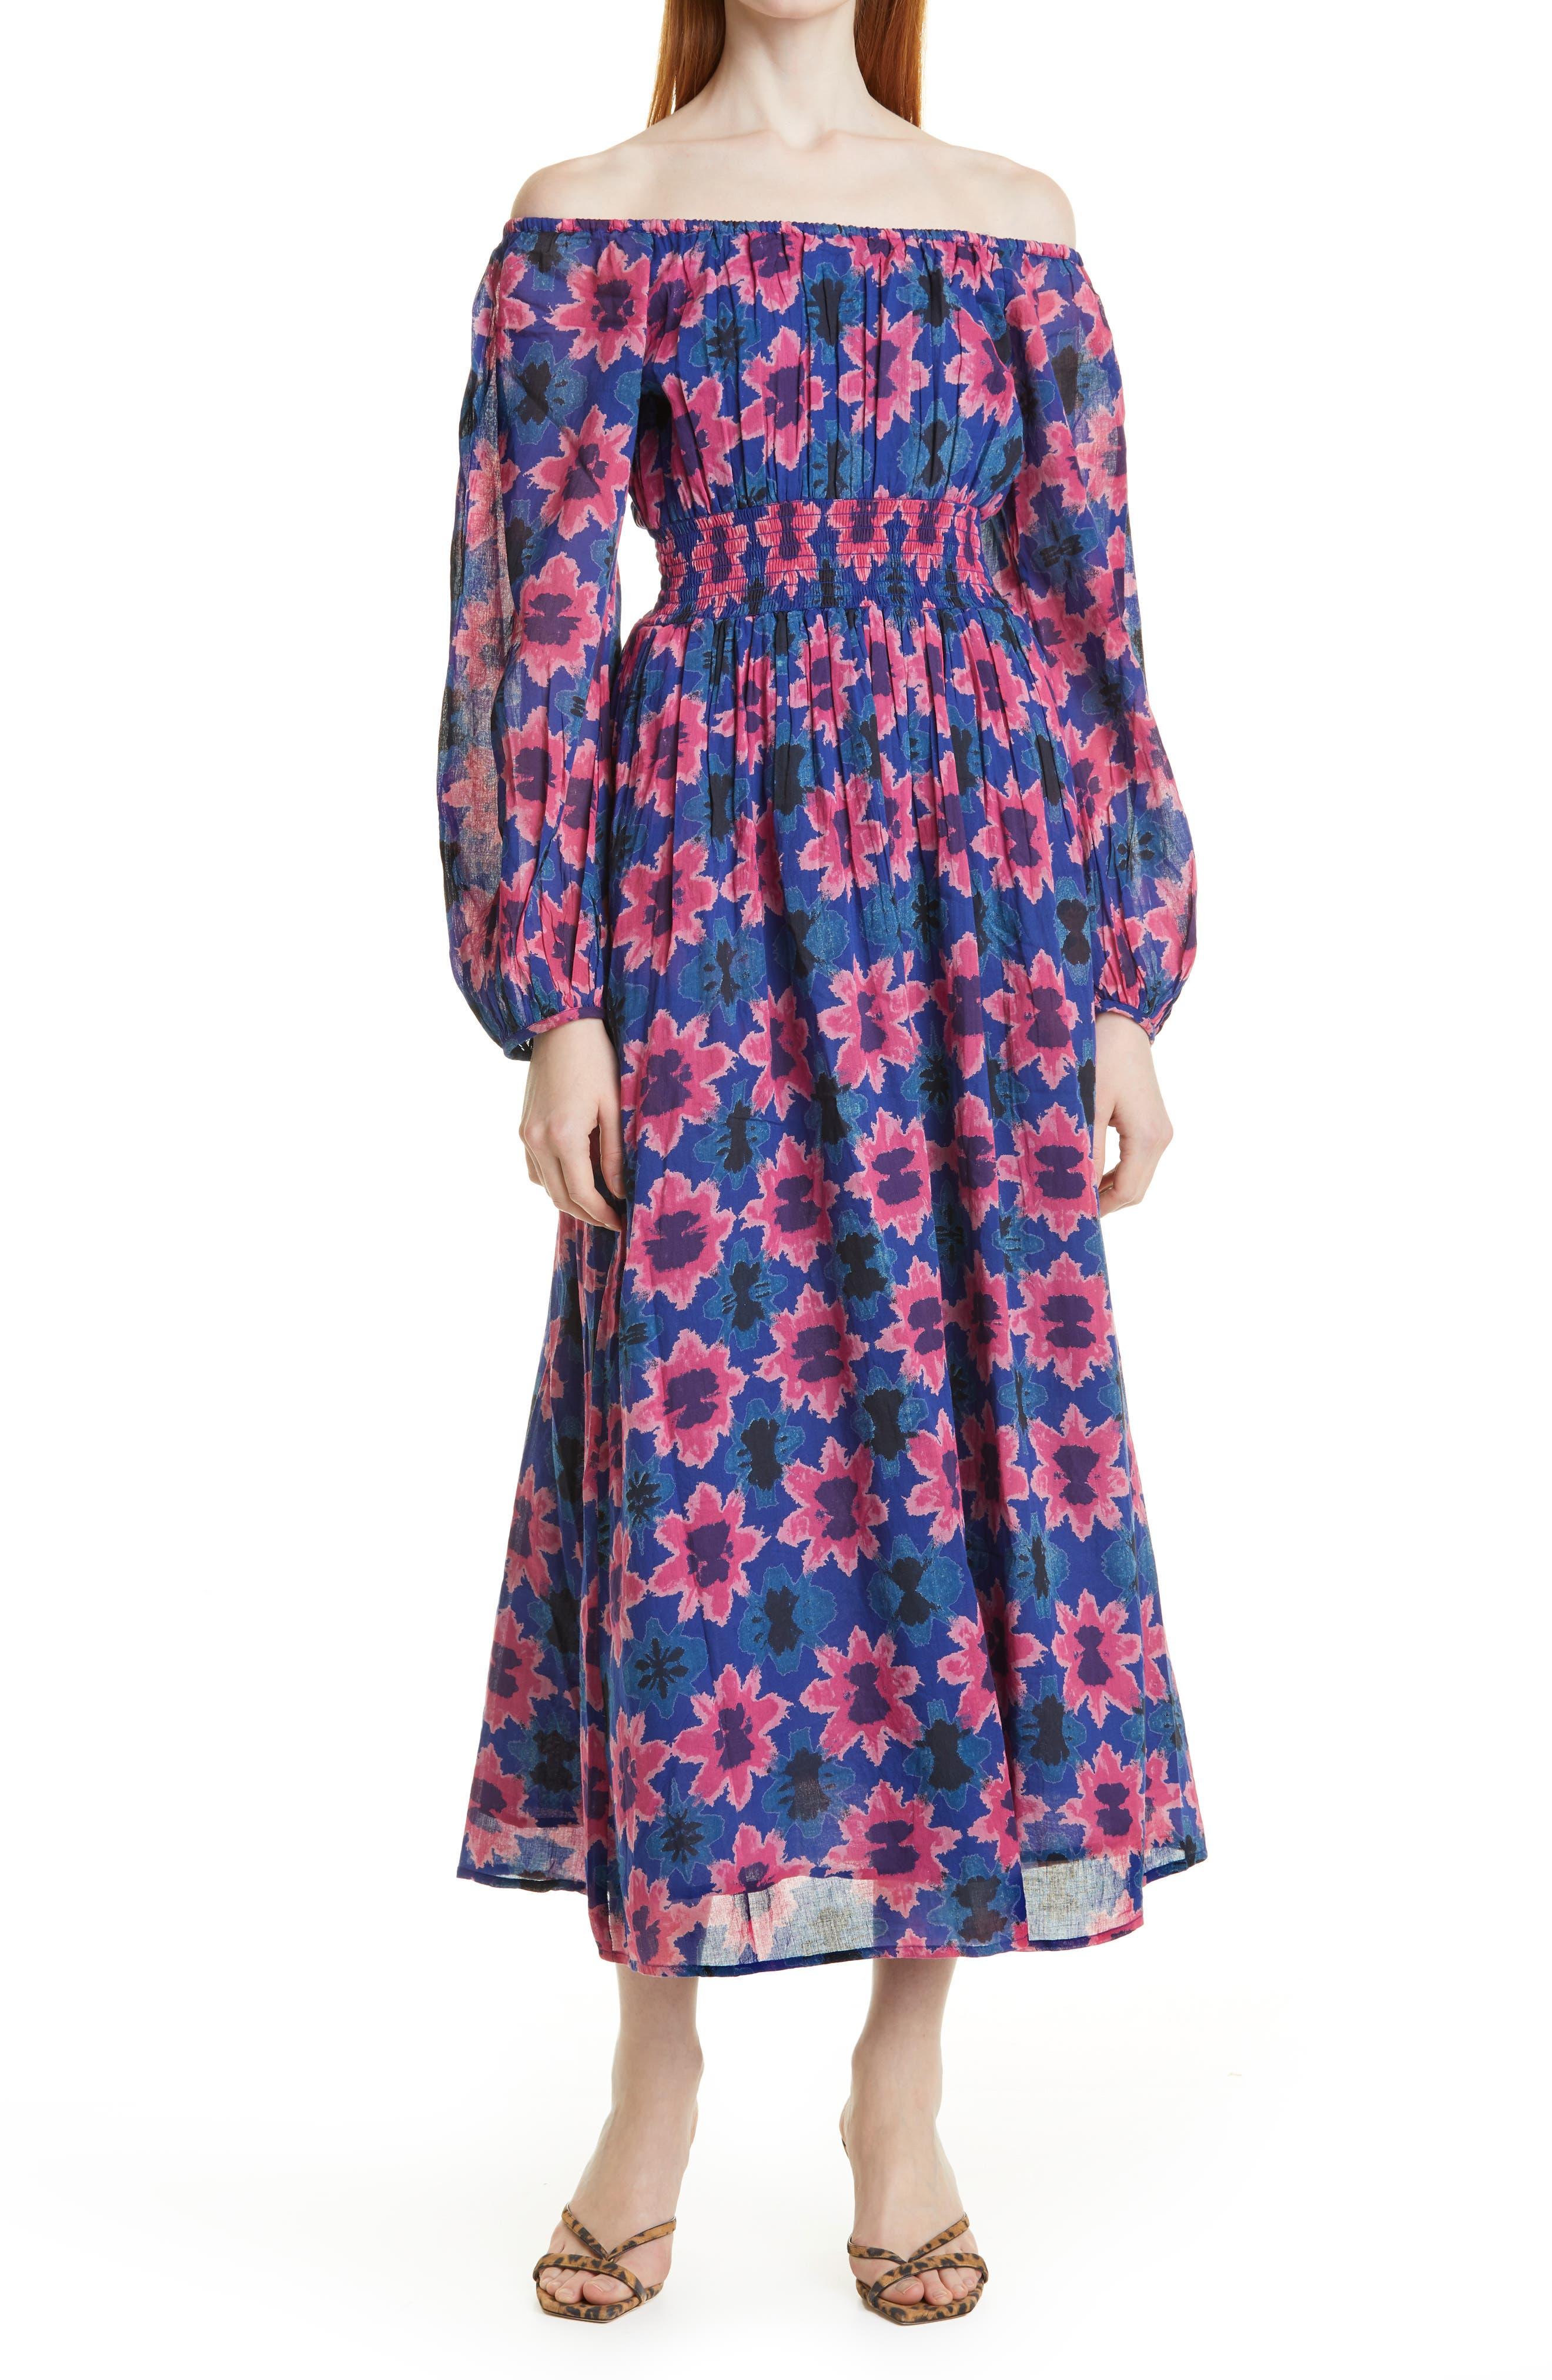 Daffodil Off The Shoulder Long Sleeve Midi Dress